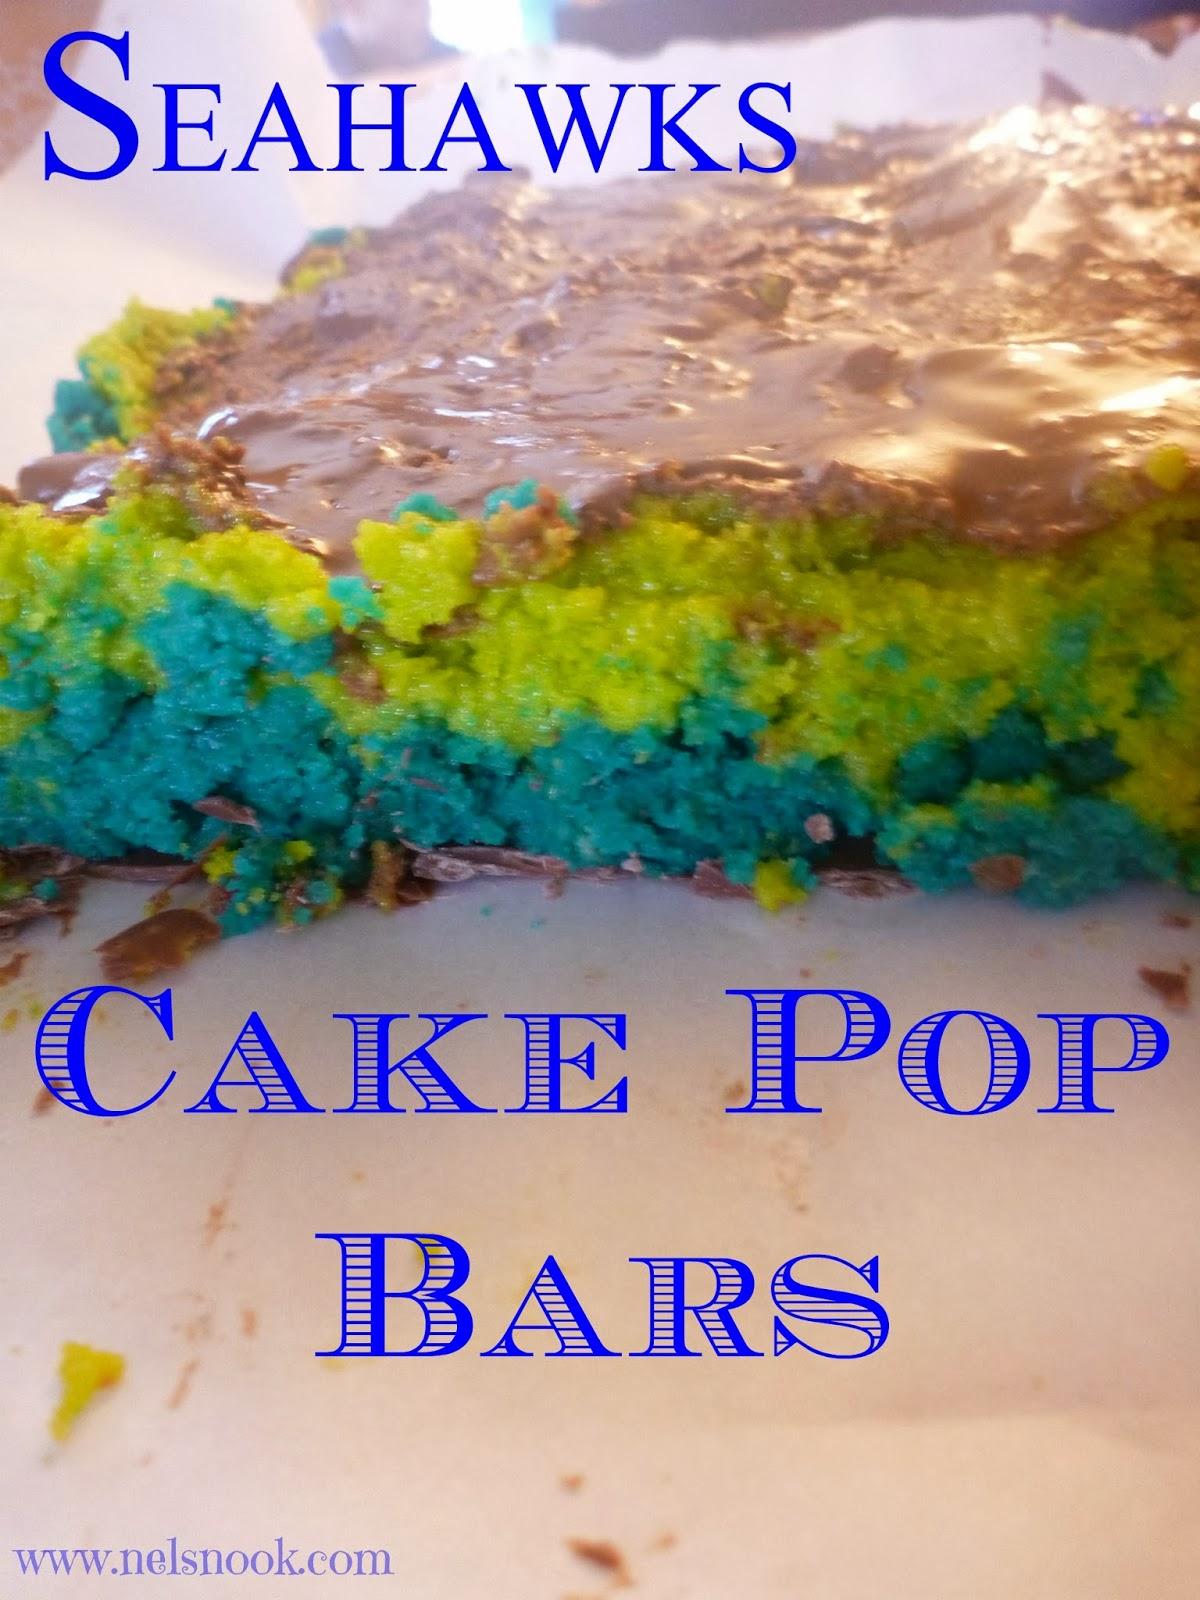 Seahawks Cake Pops Seahawks Cake Pop Bars